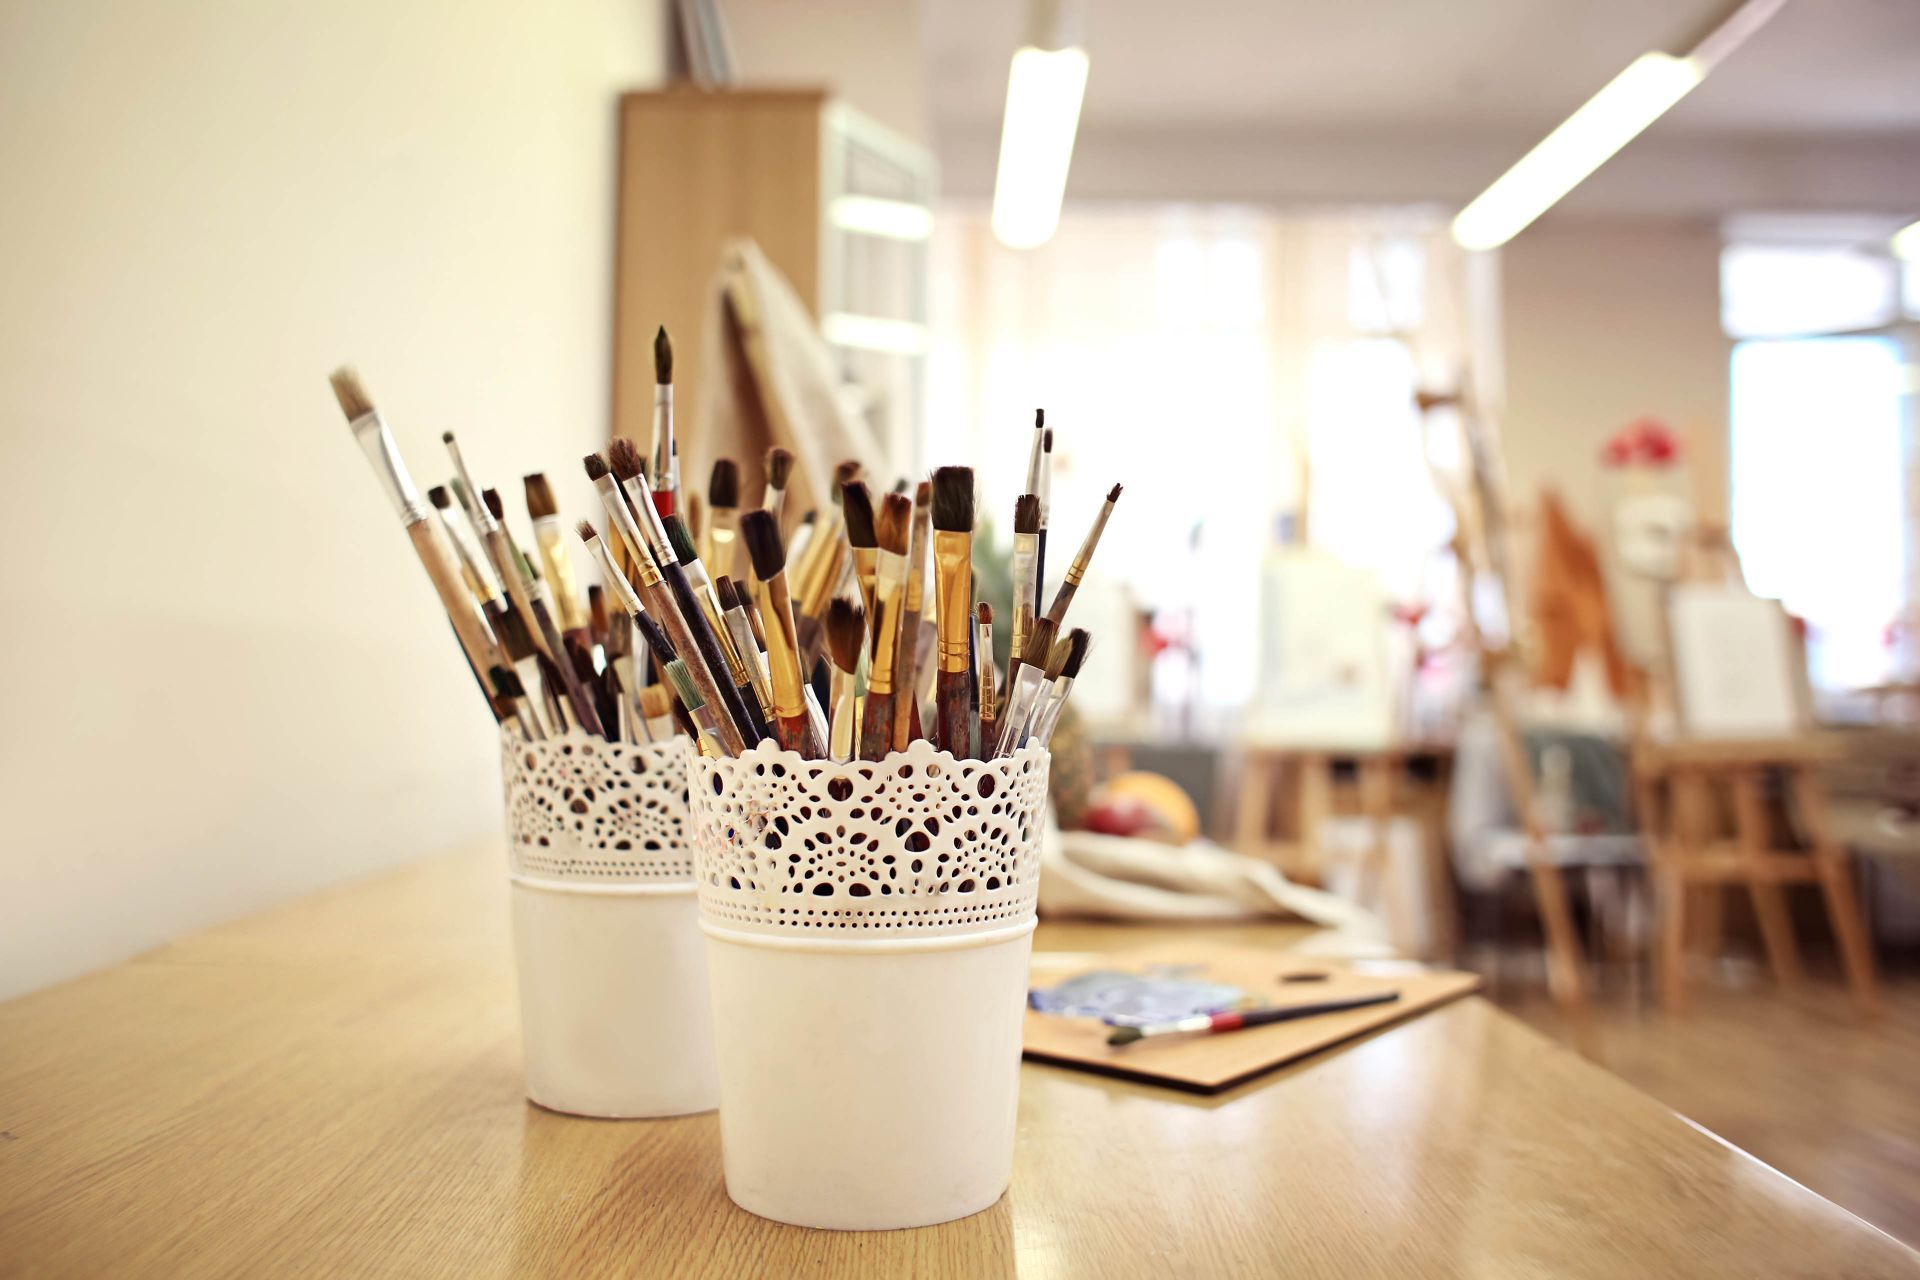 Greece workshops: Painting